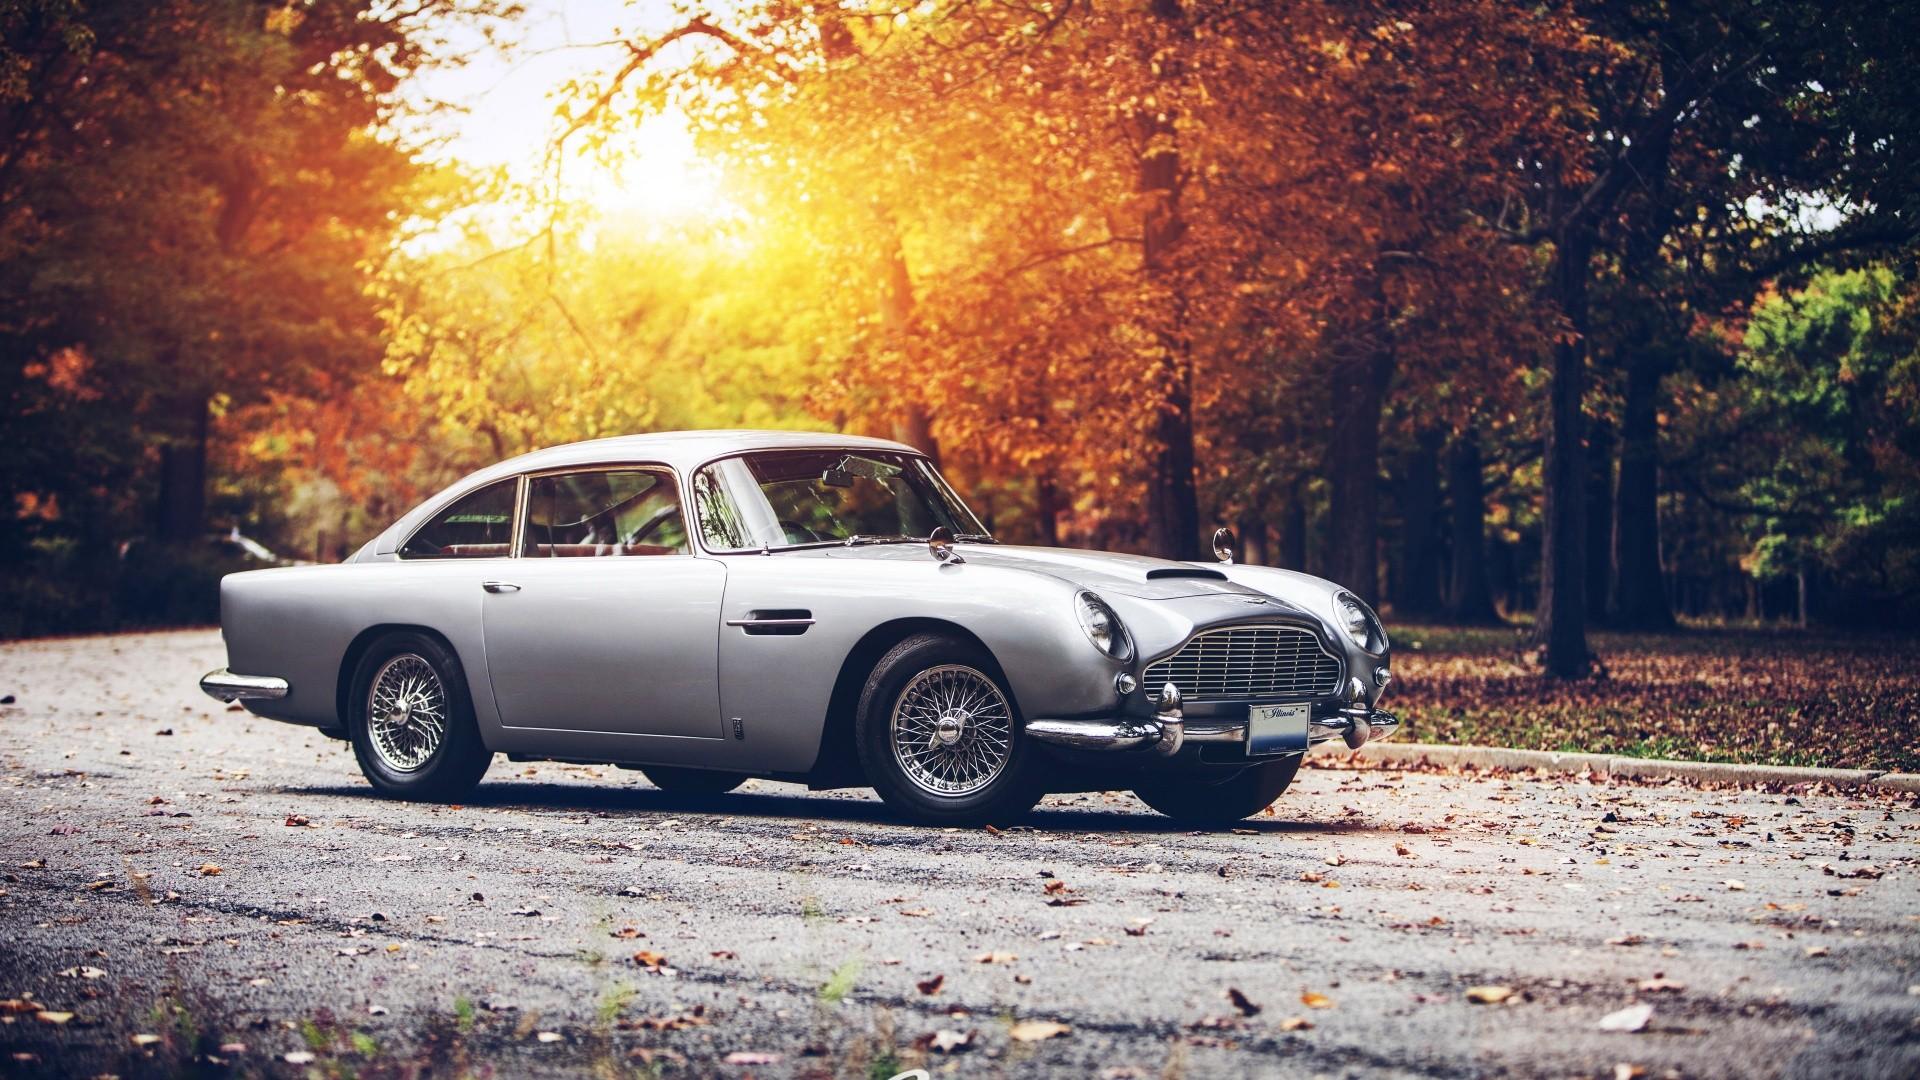 Wallpaper 1920x1080 Px Aston Martin Db5 Bond Cars Car James